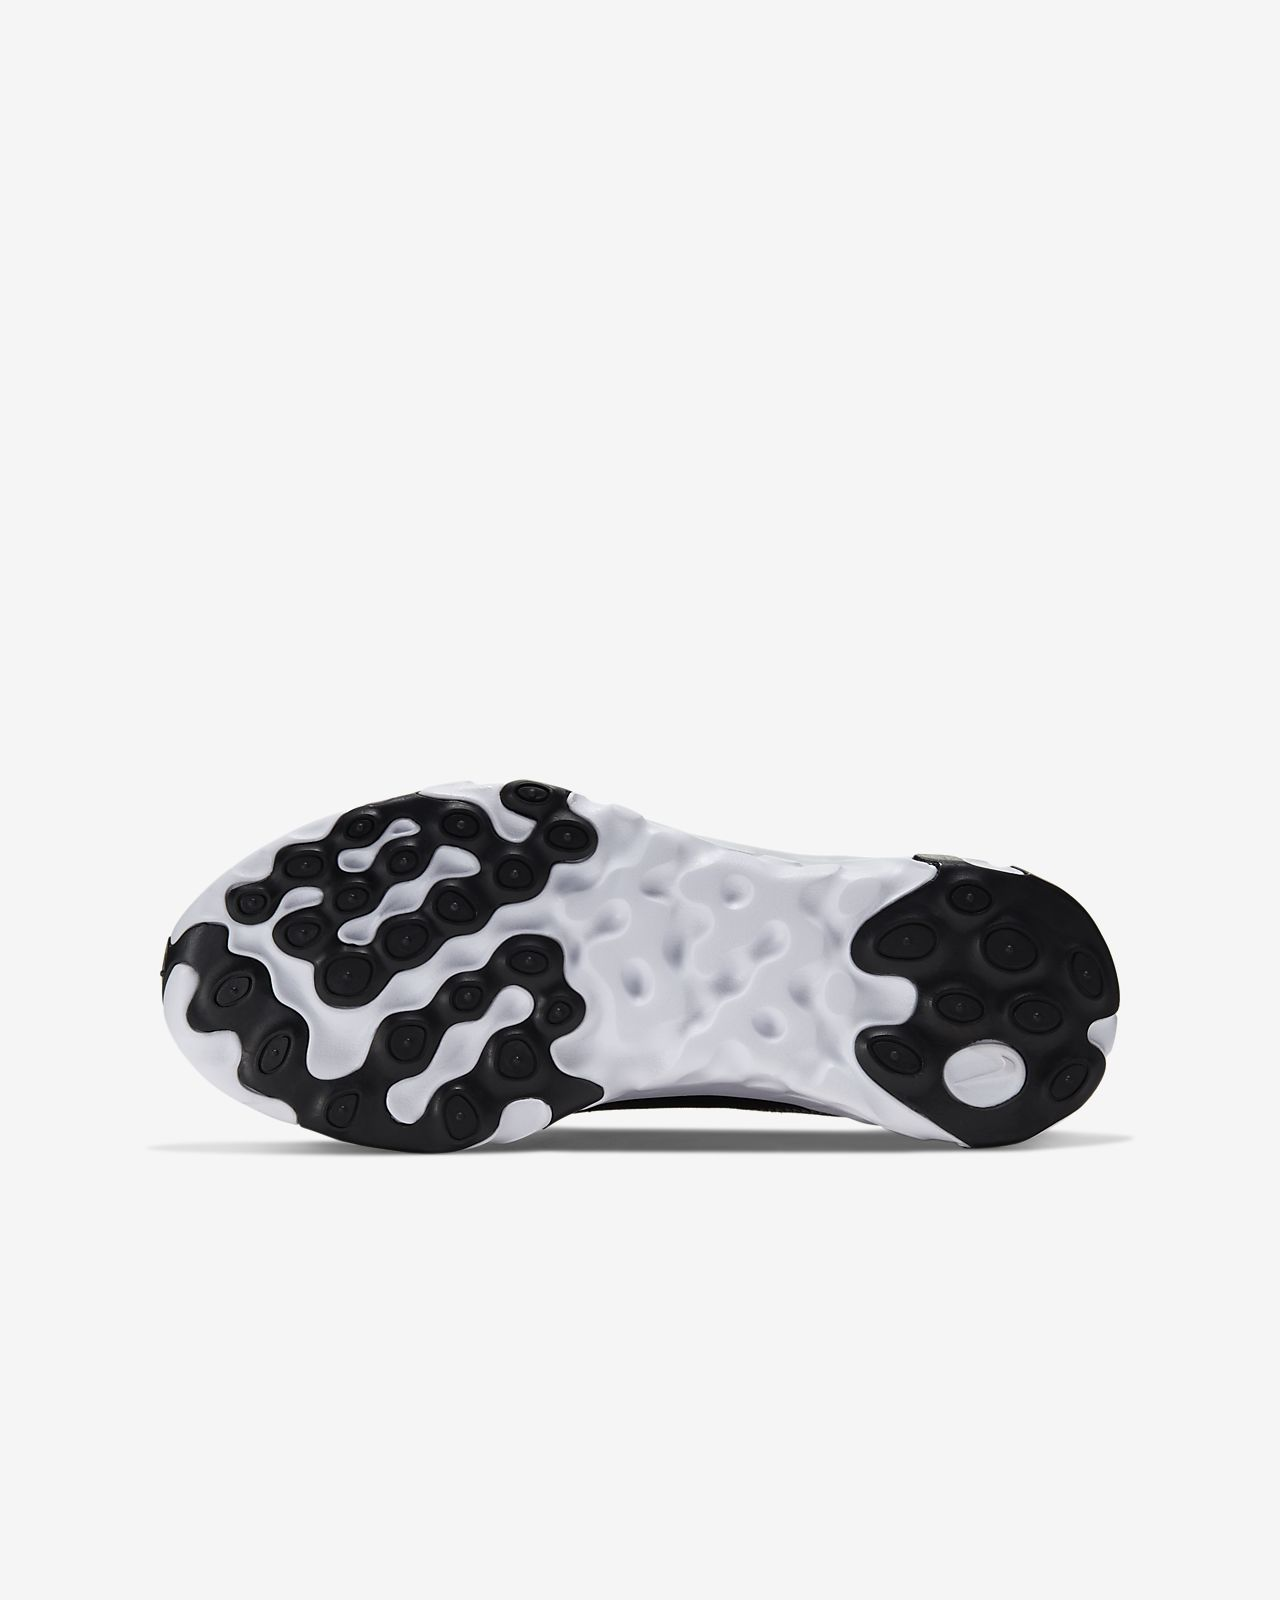 chaussure nike enfant garçon 29